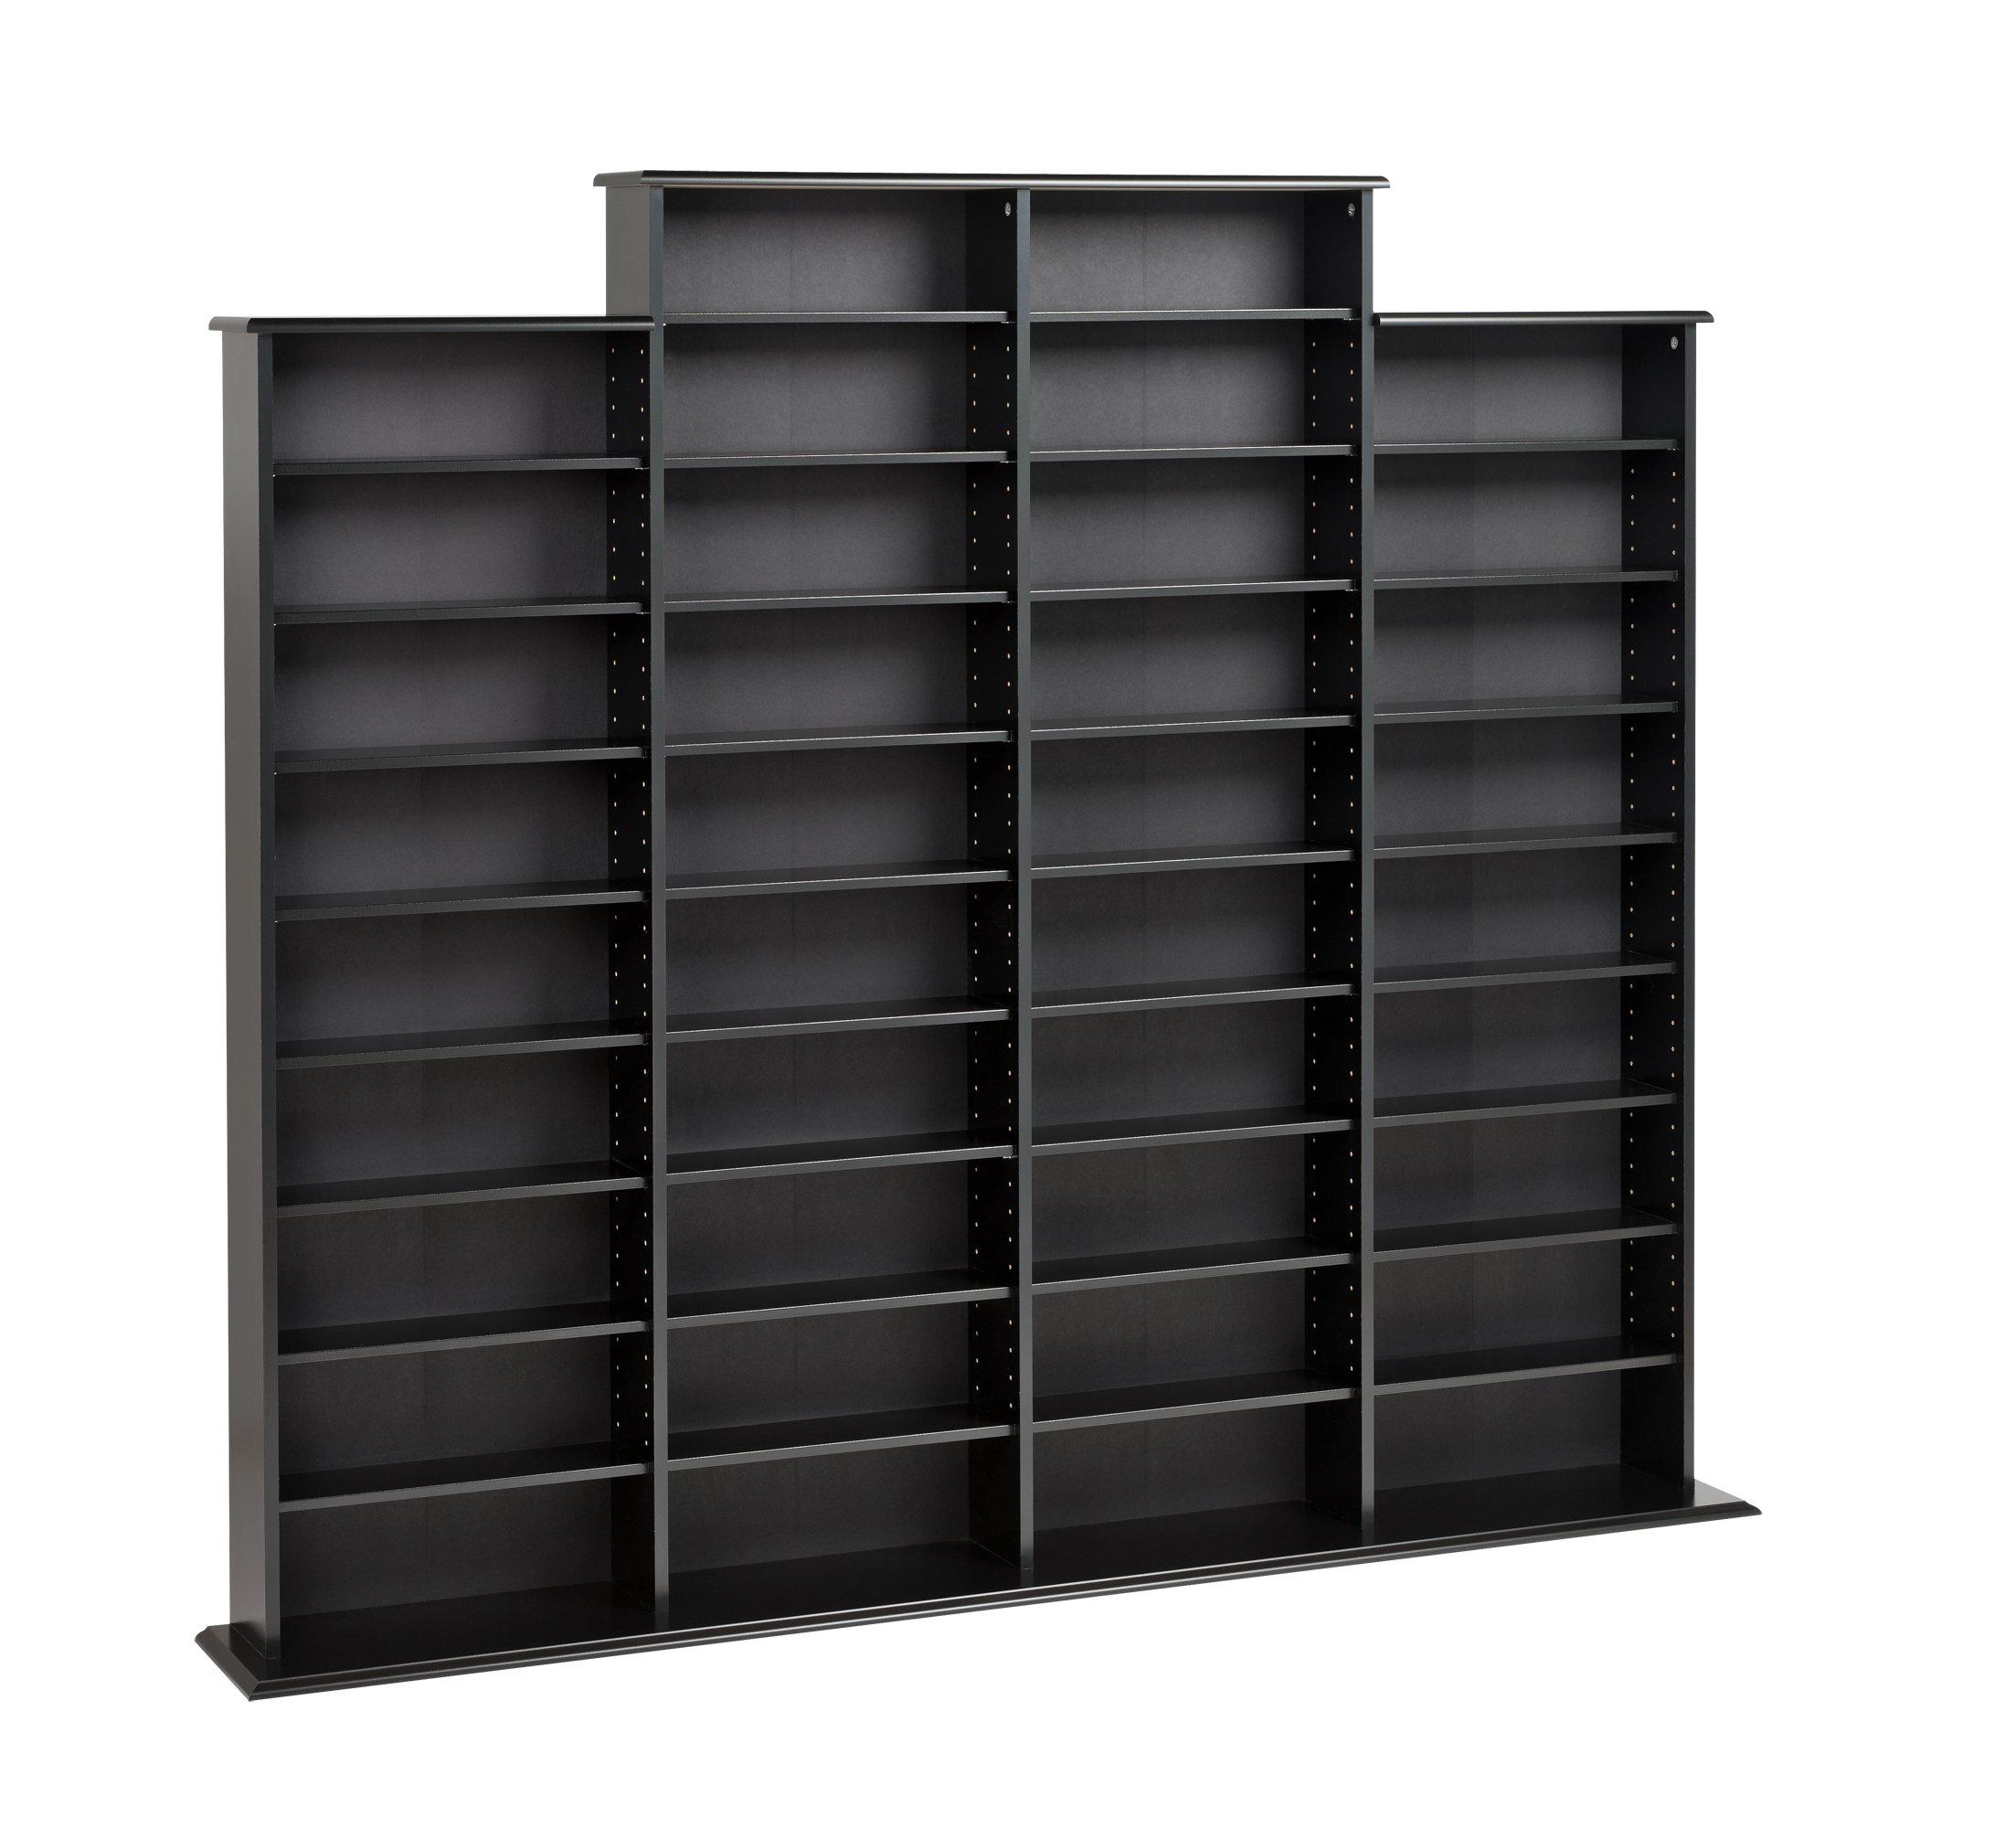 Prepac Quad Width Wall  Storage Cabinet, Black by Prepac